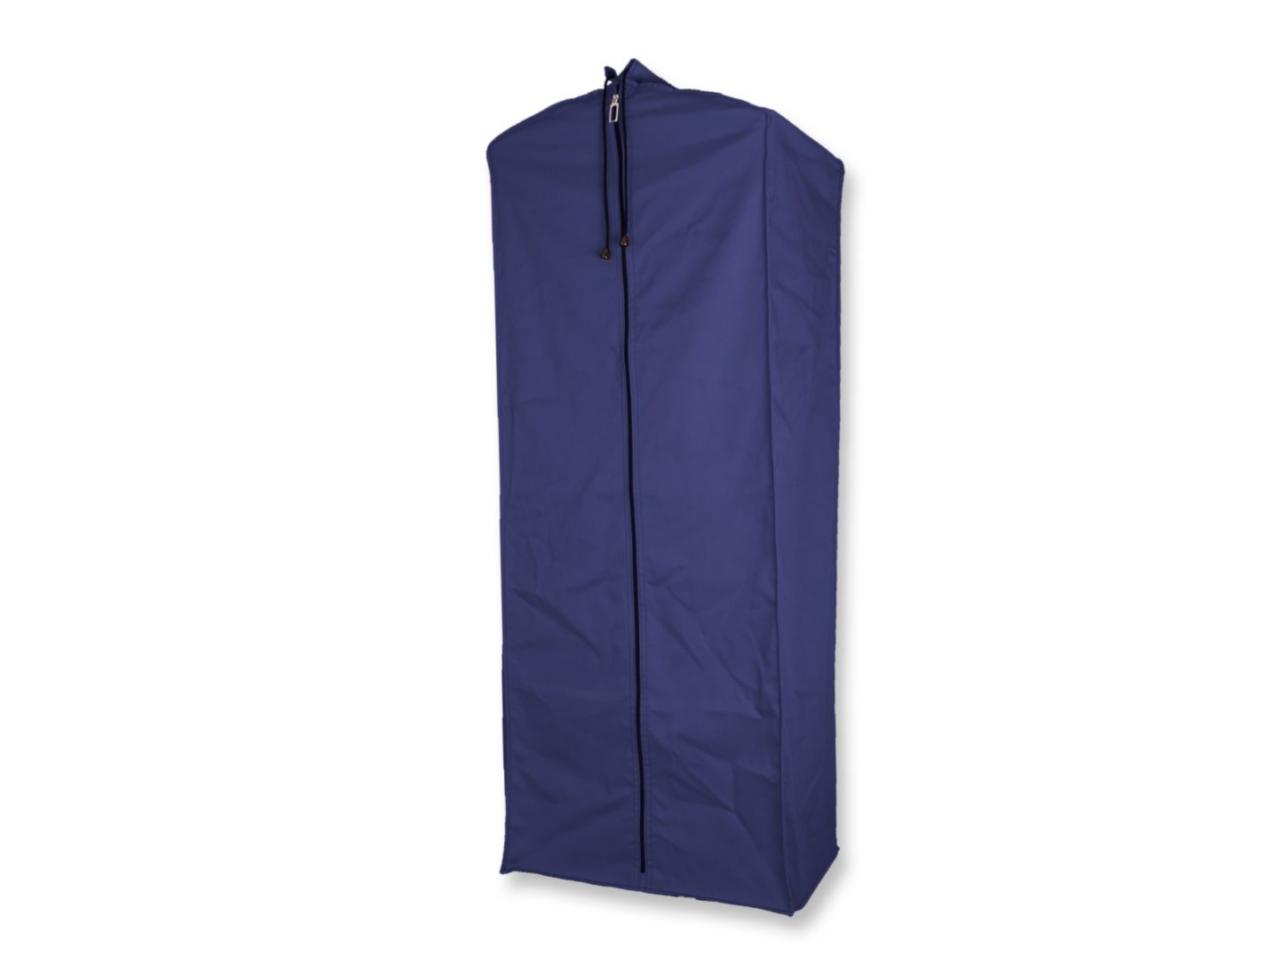 Kollektionskleidersack